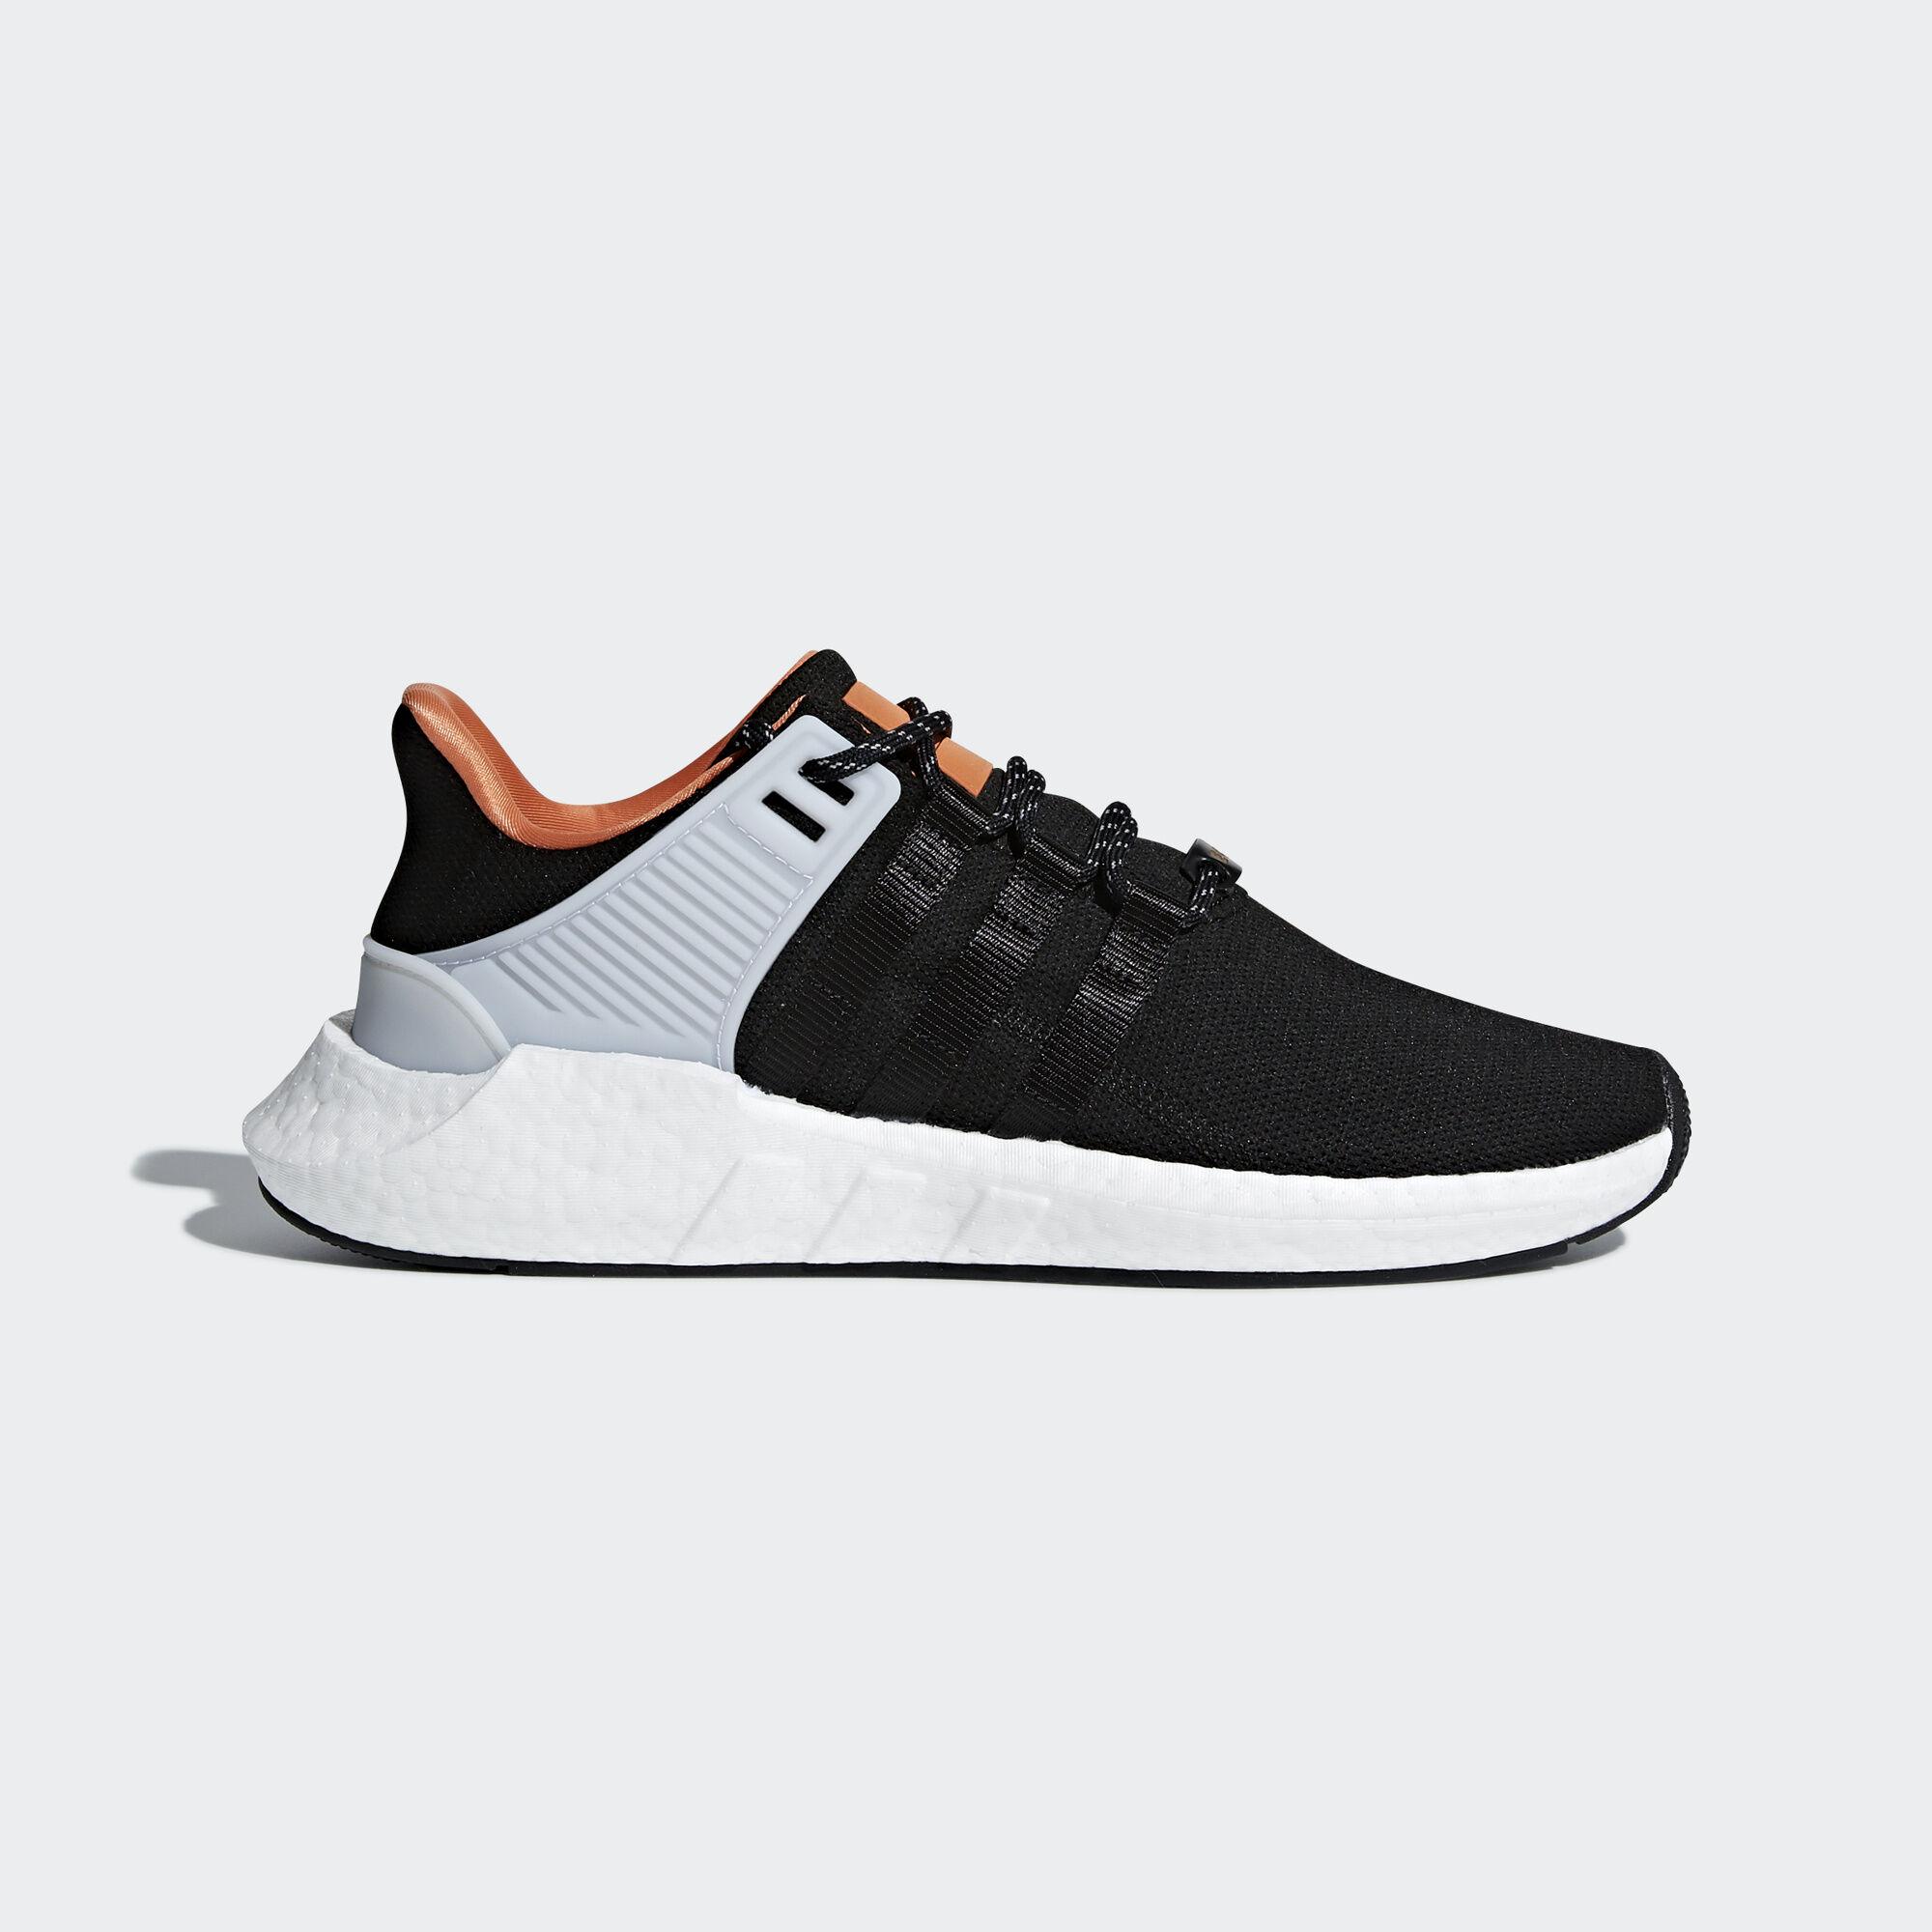 c1abed99cf5c6f adidas - EQT Support 93 17 Shoes Core Black Core Black Ftwr White